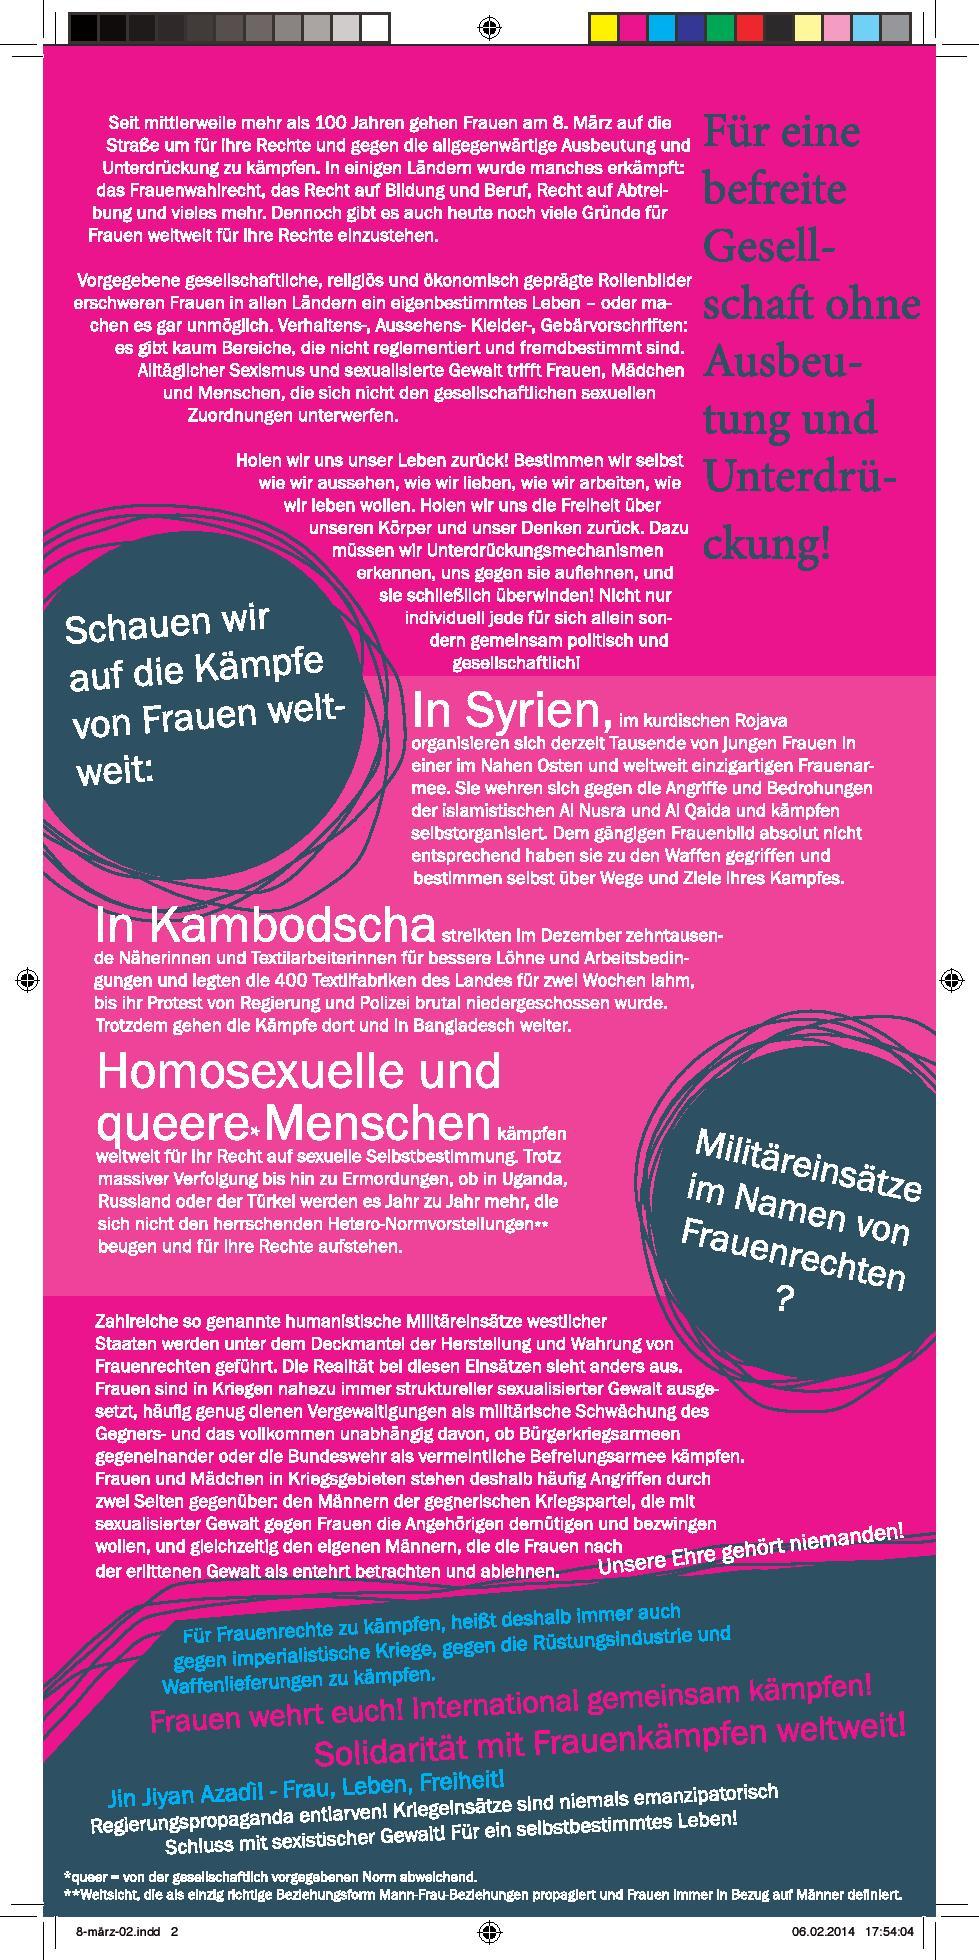 Frauenkampftag Nürnberg